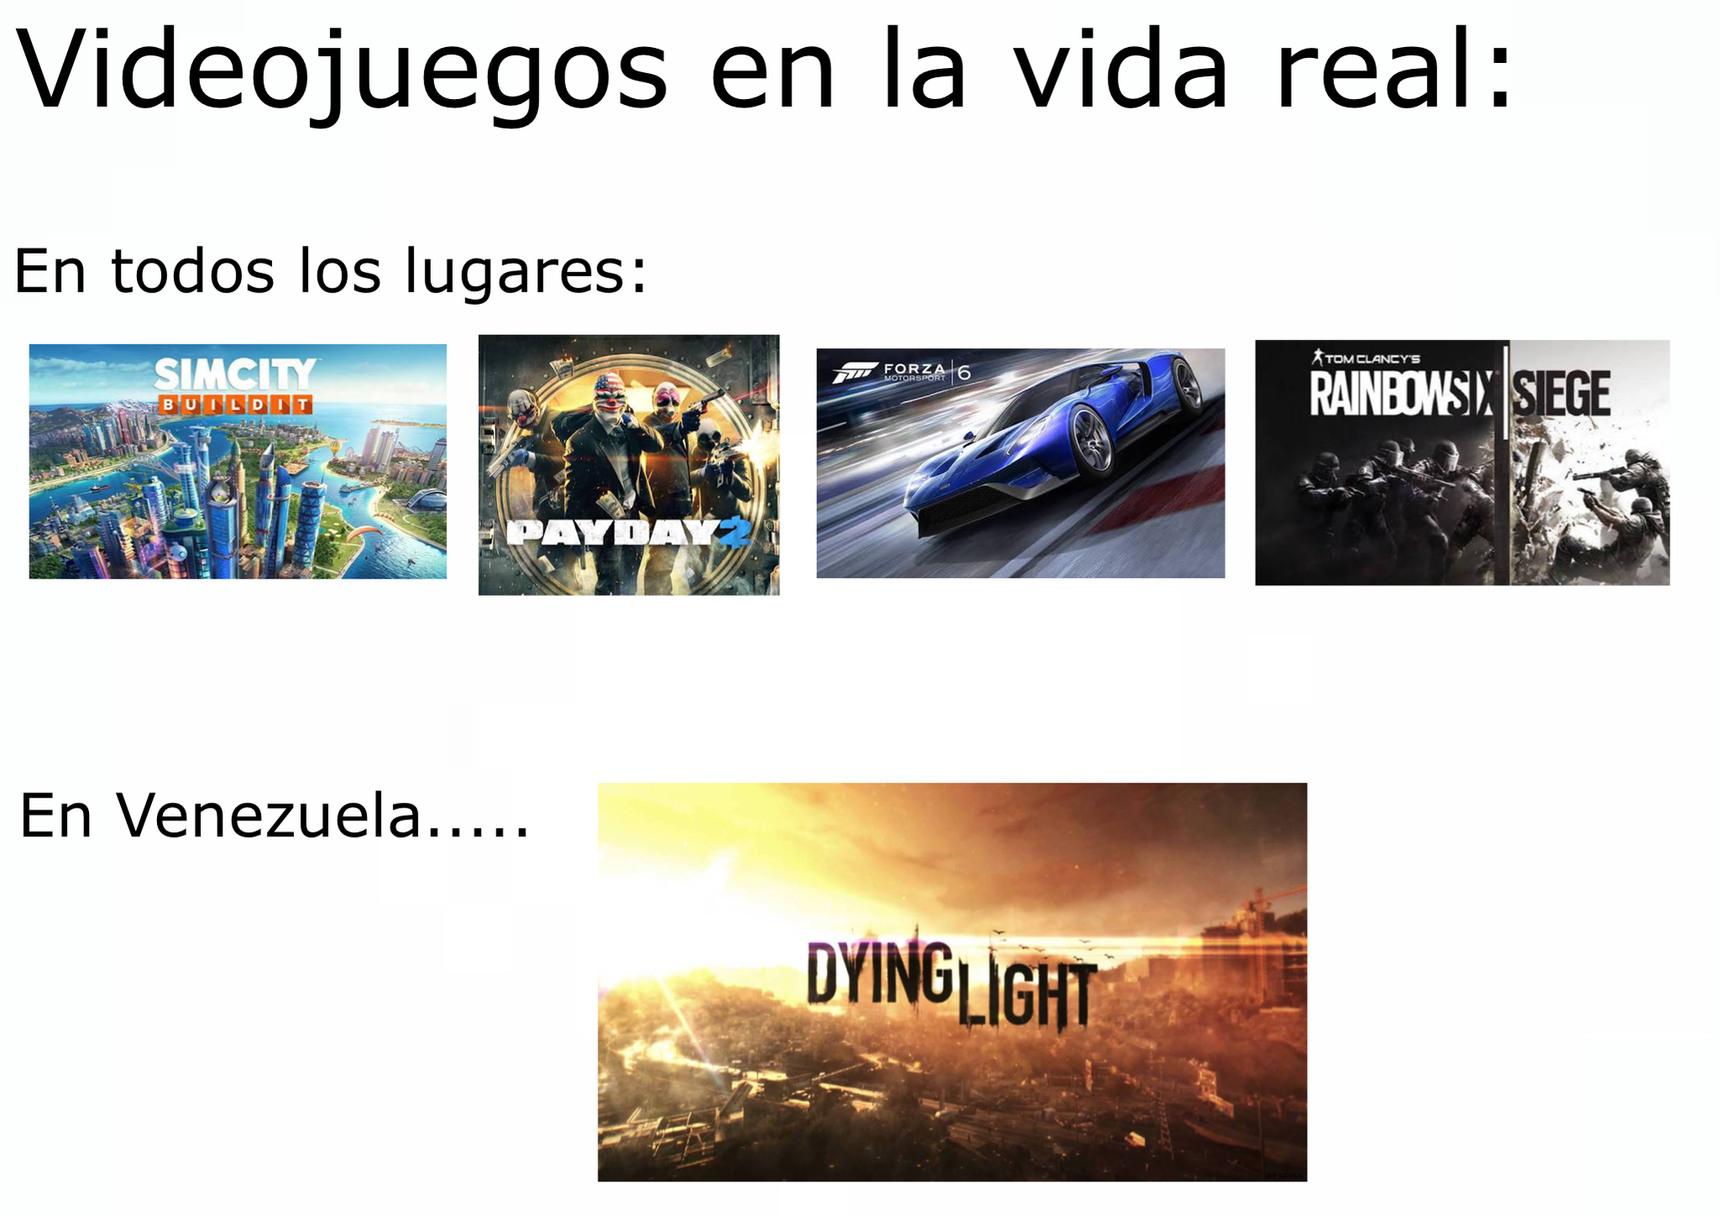 Juegos realehhhhhh - meme